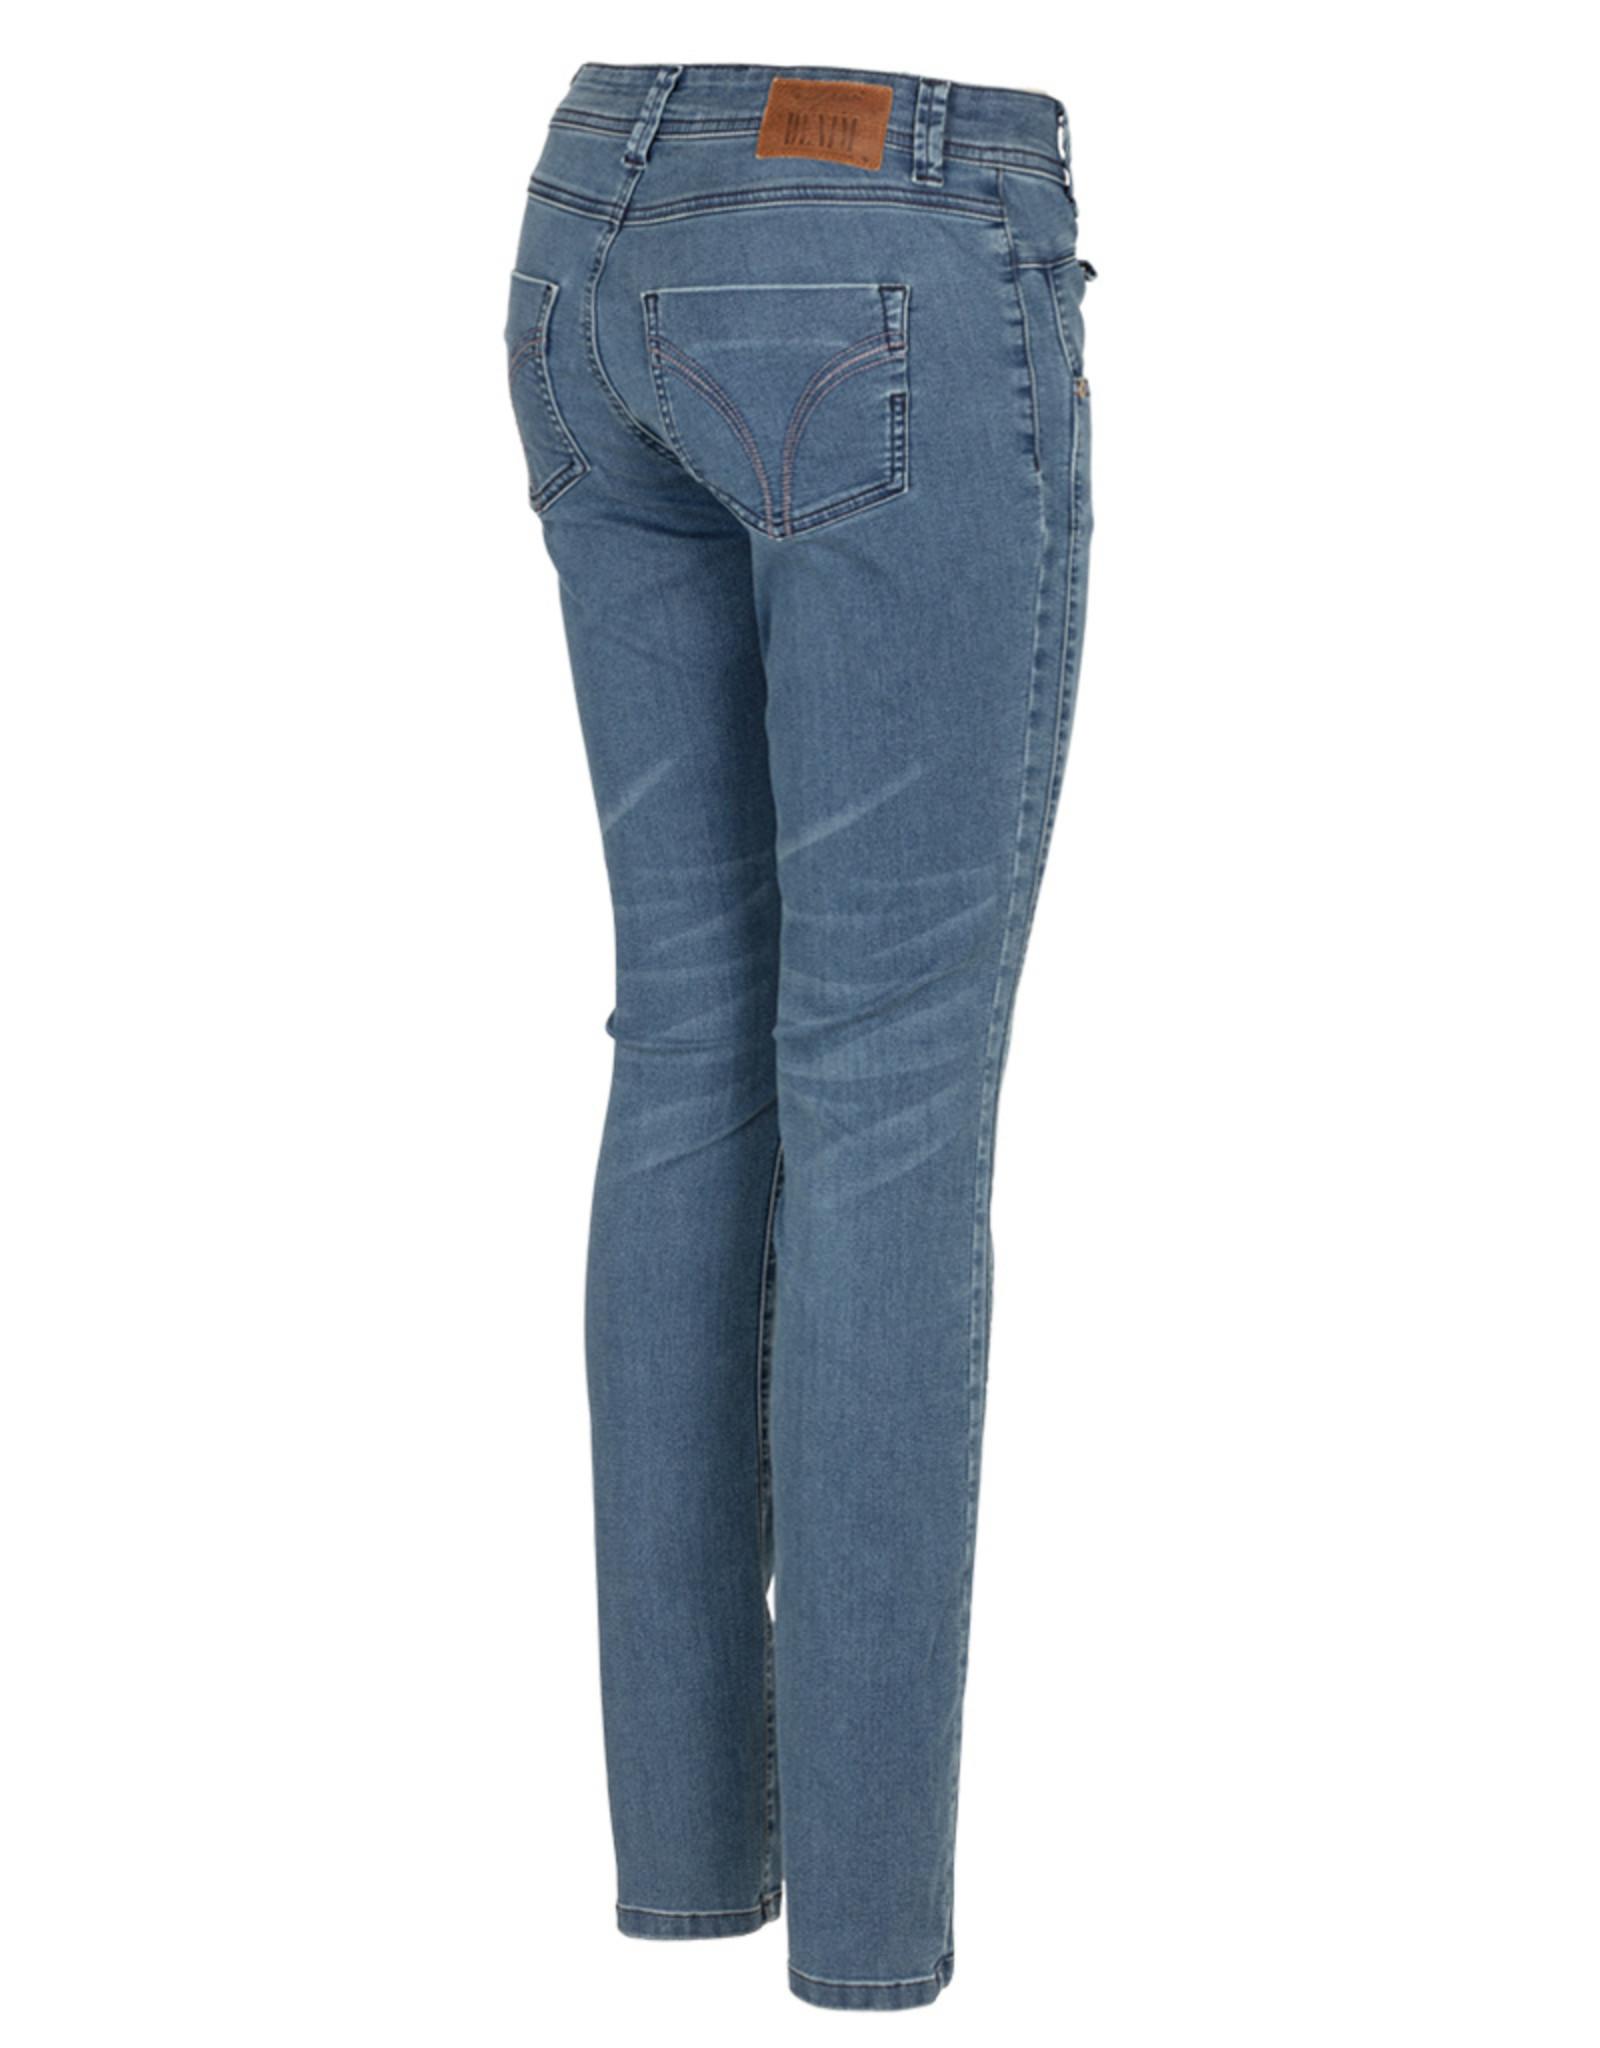 Nickjean Broek Sydney Jeans stone